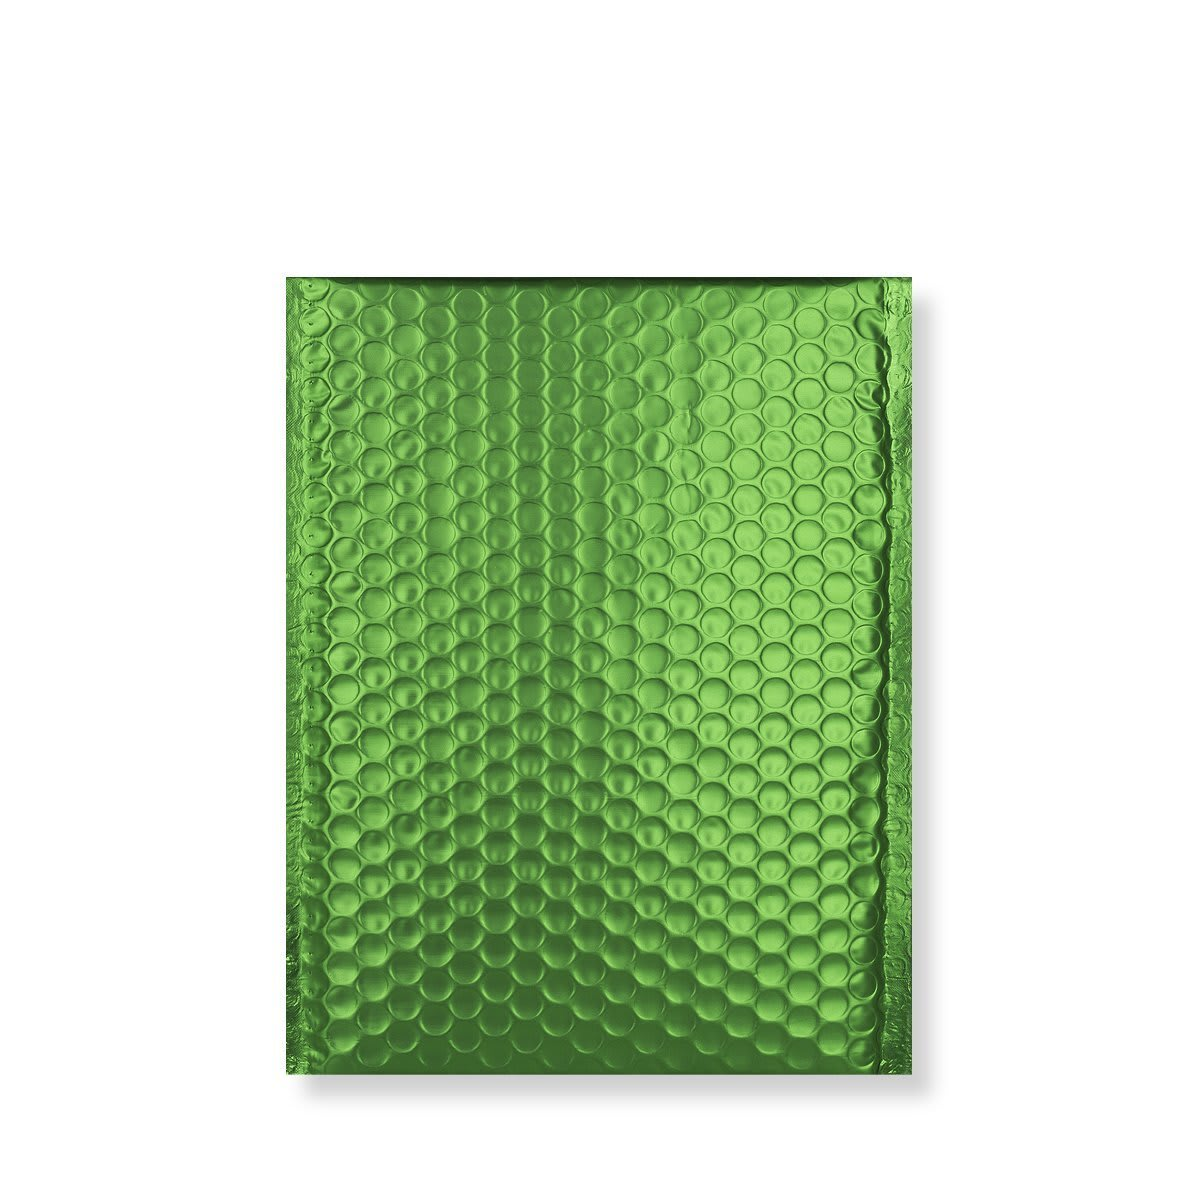 C5 + MATT METALLIC GREEN PADDED ENVELOPES (250 x 180MM)